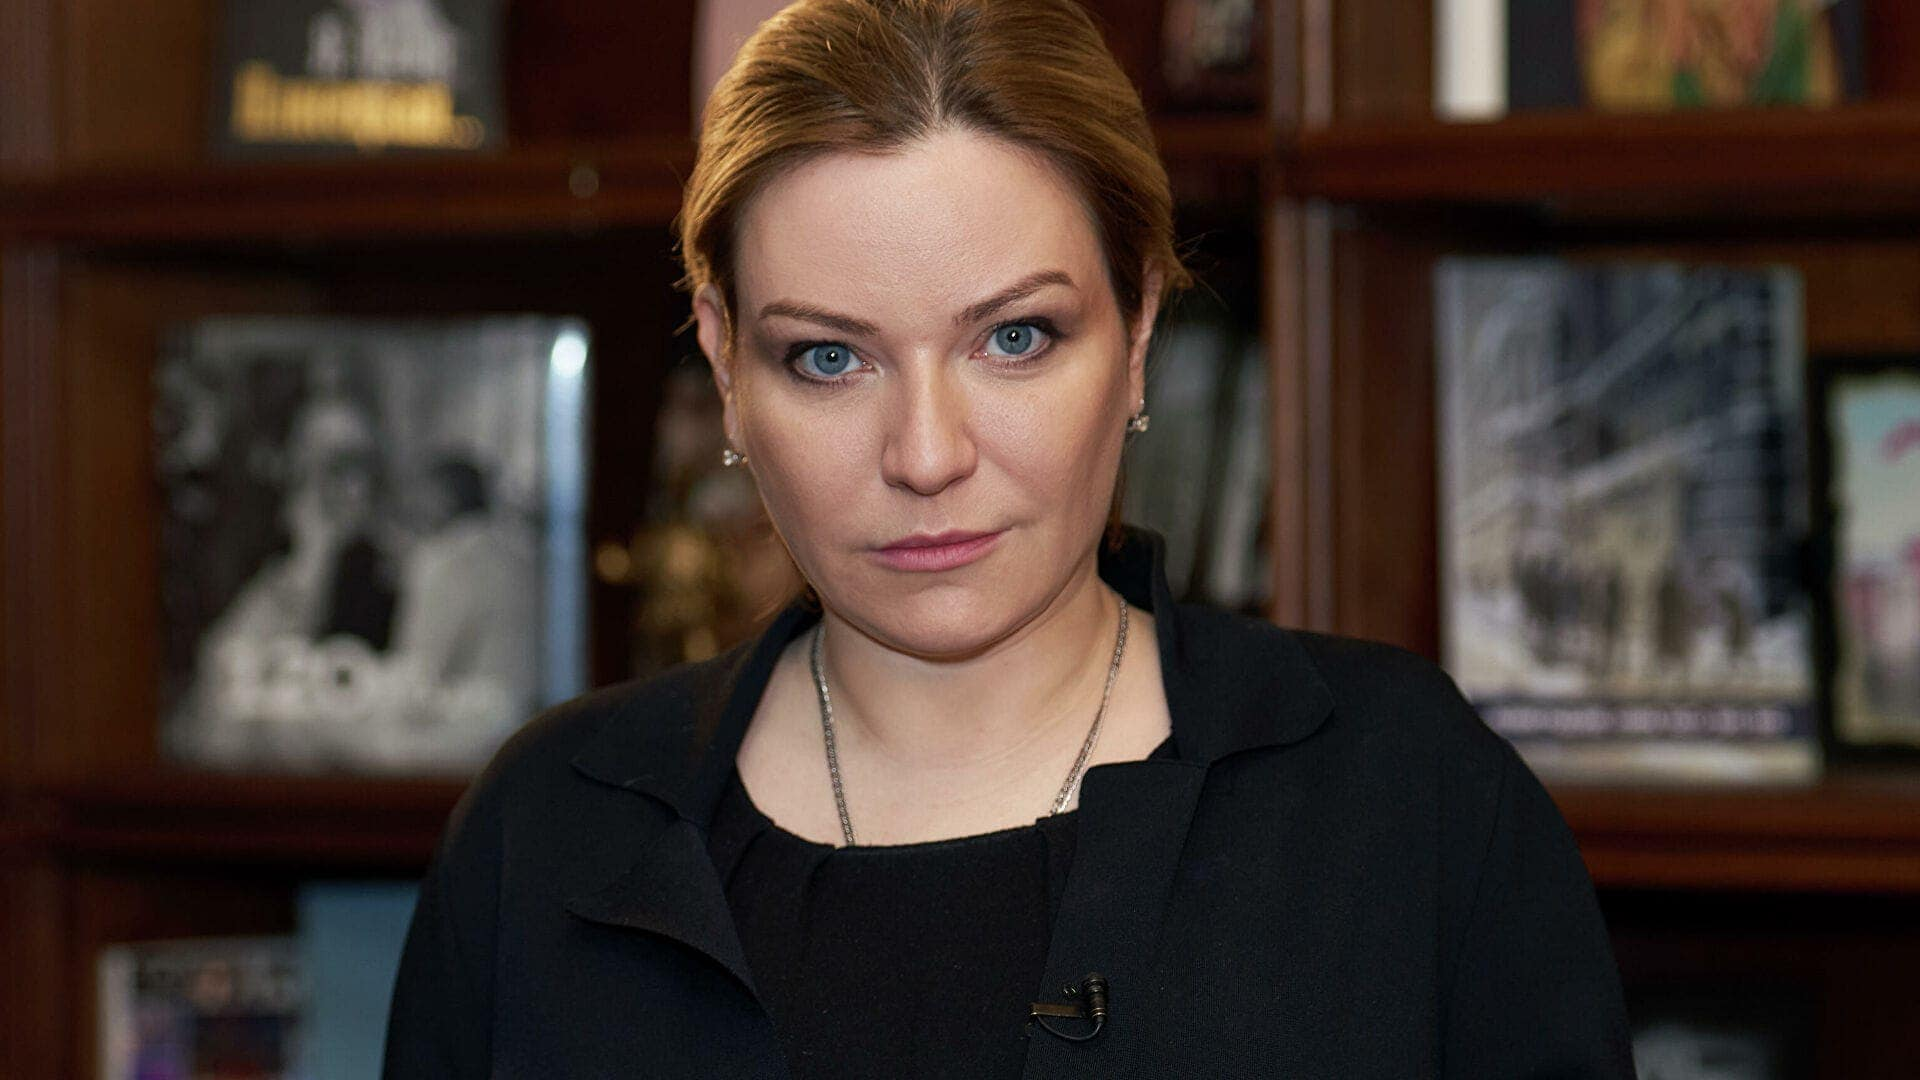 اولگا لیوبیمووا